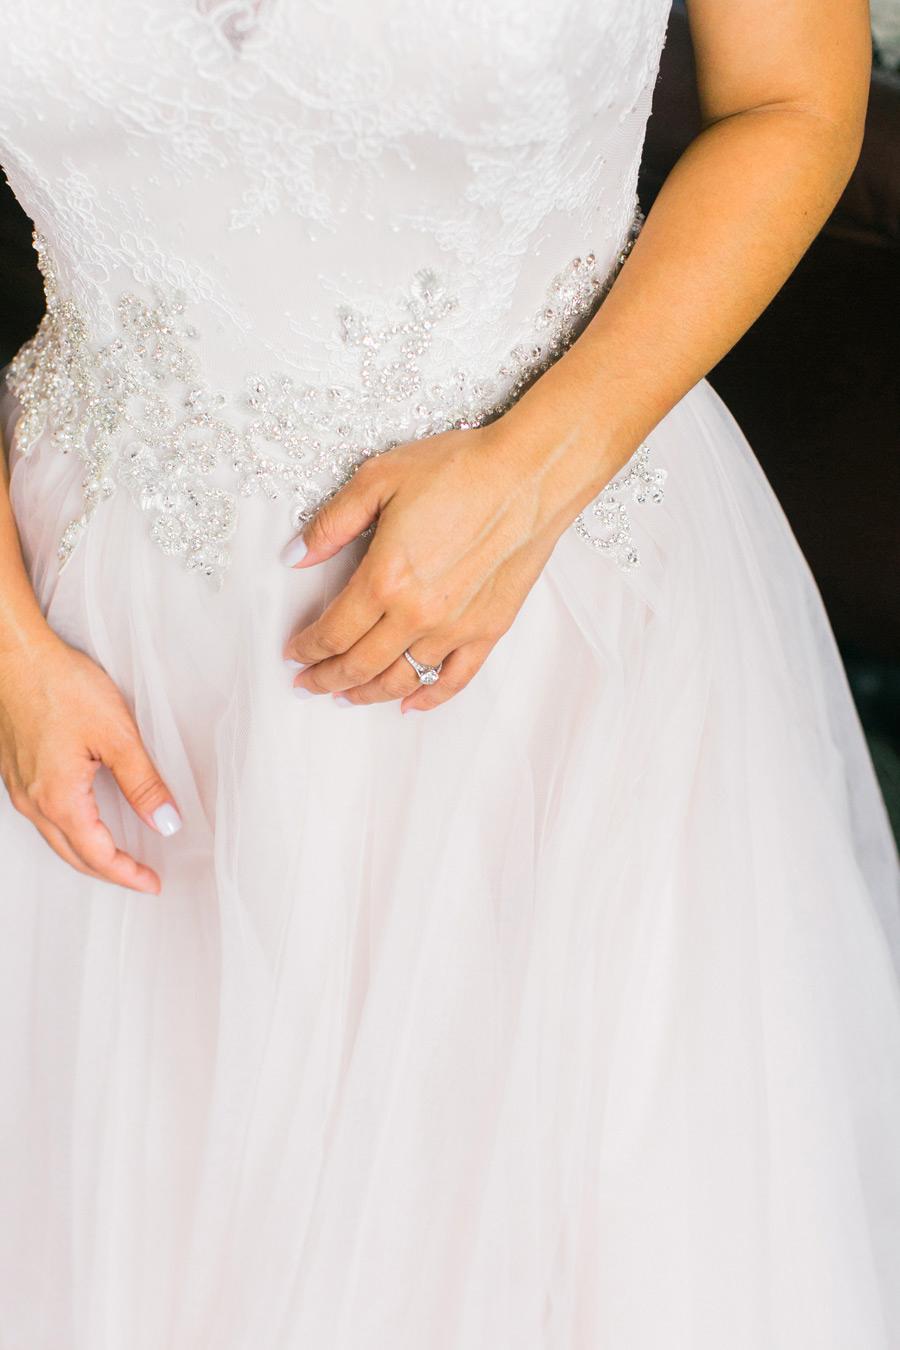 danada-house-wedding-006